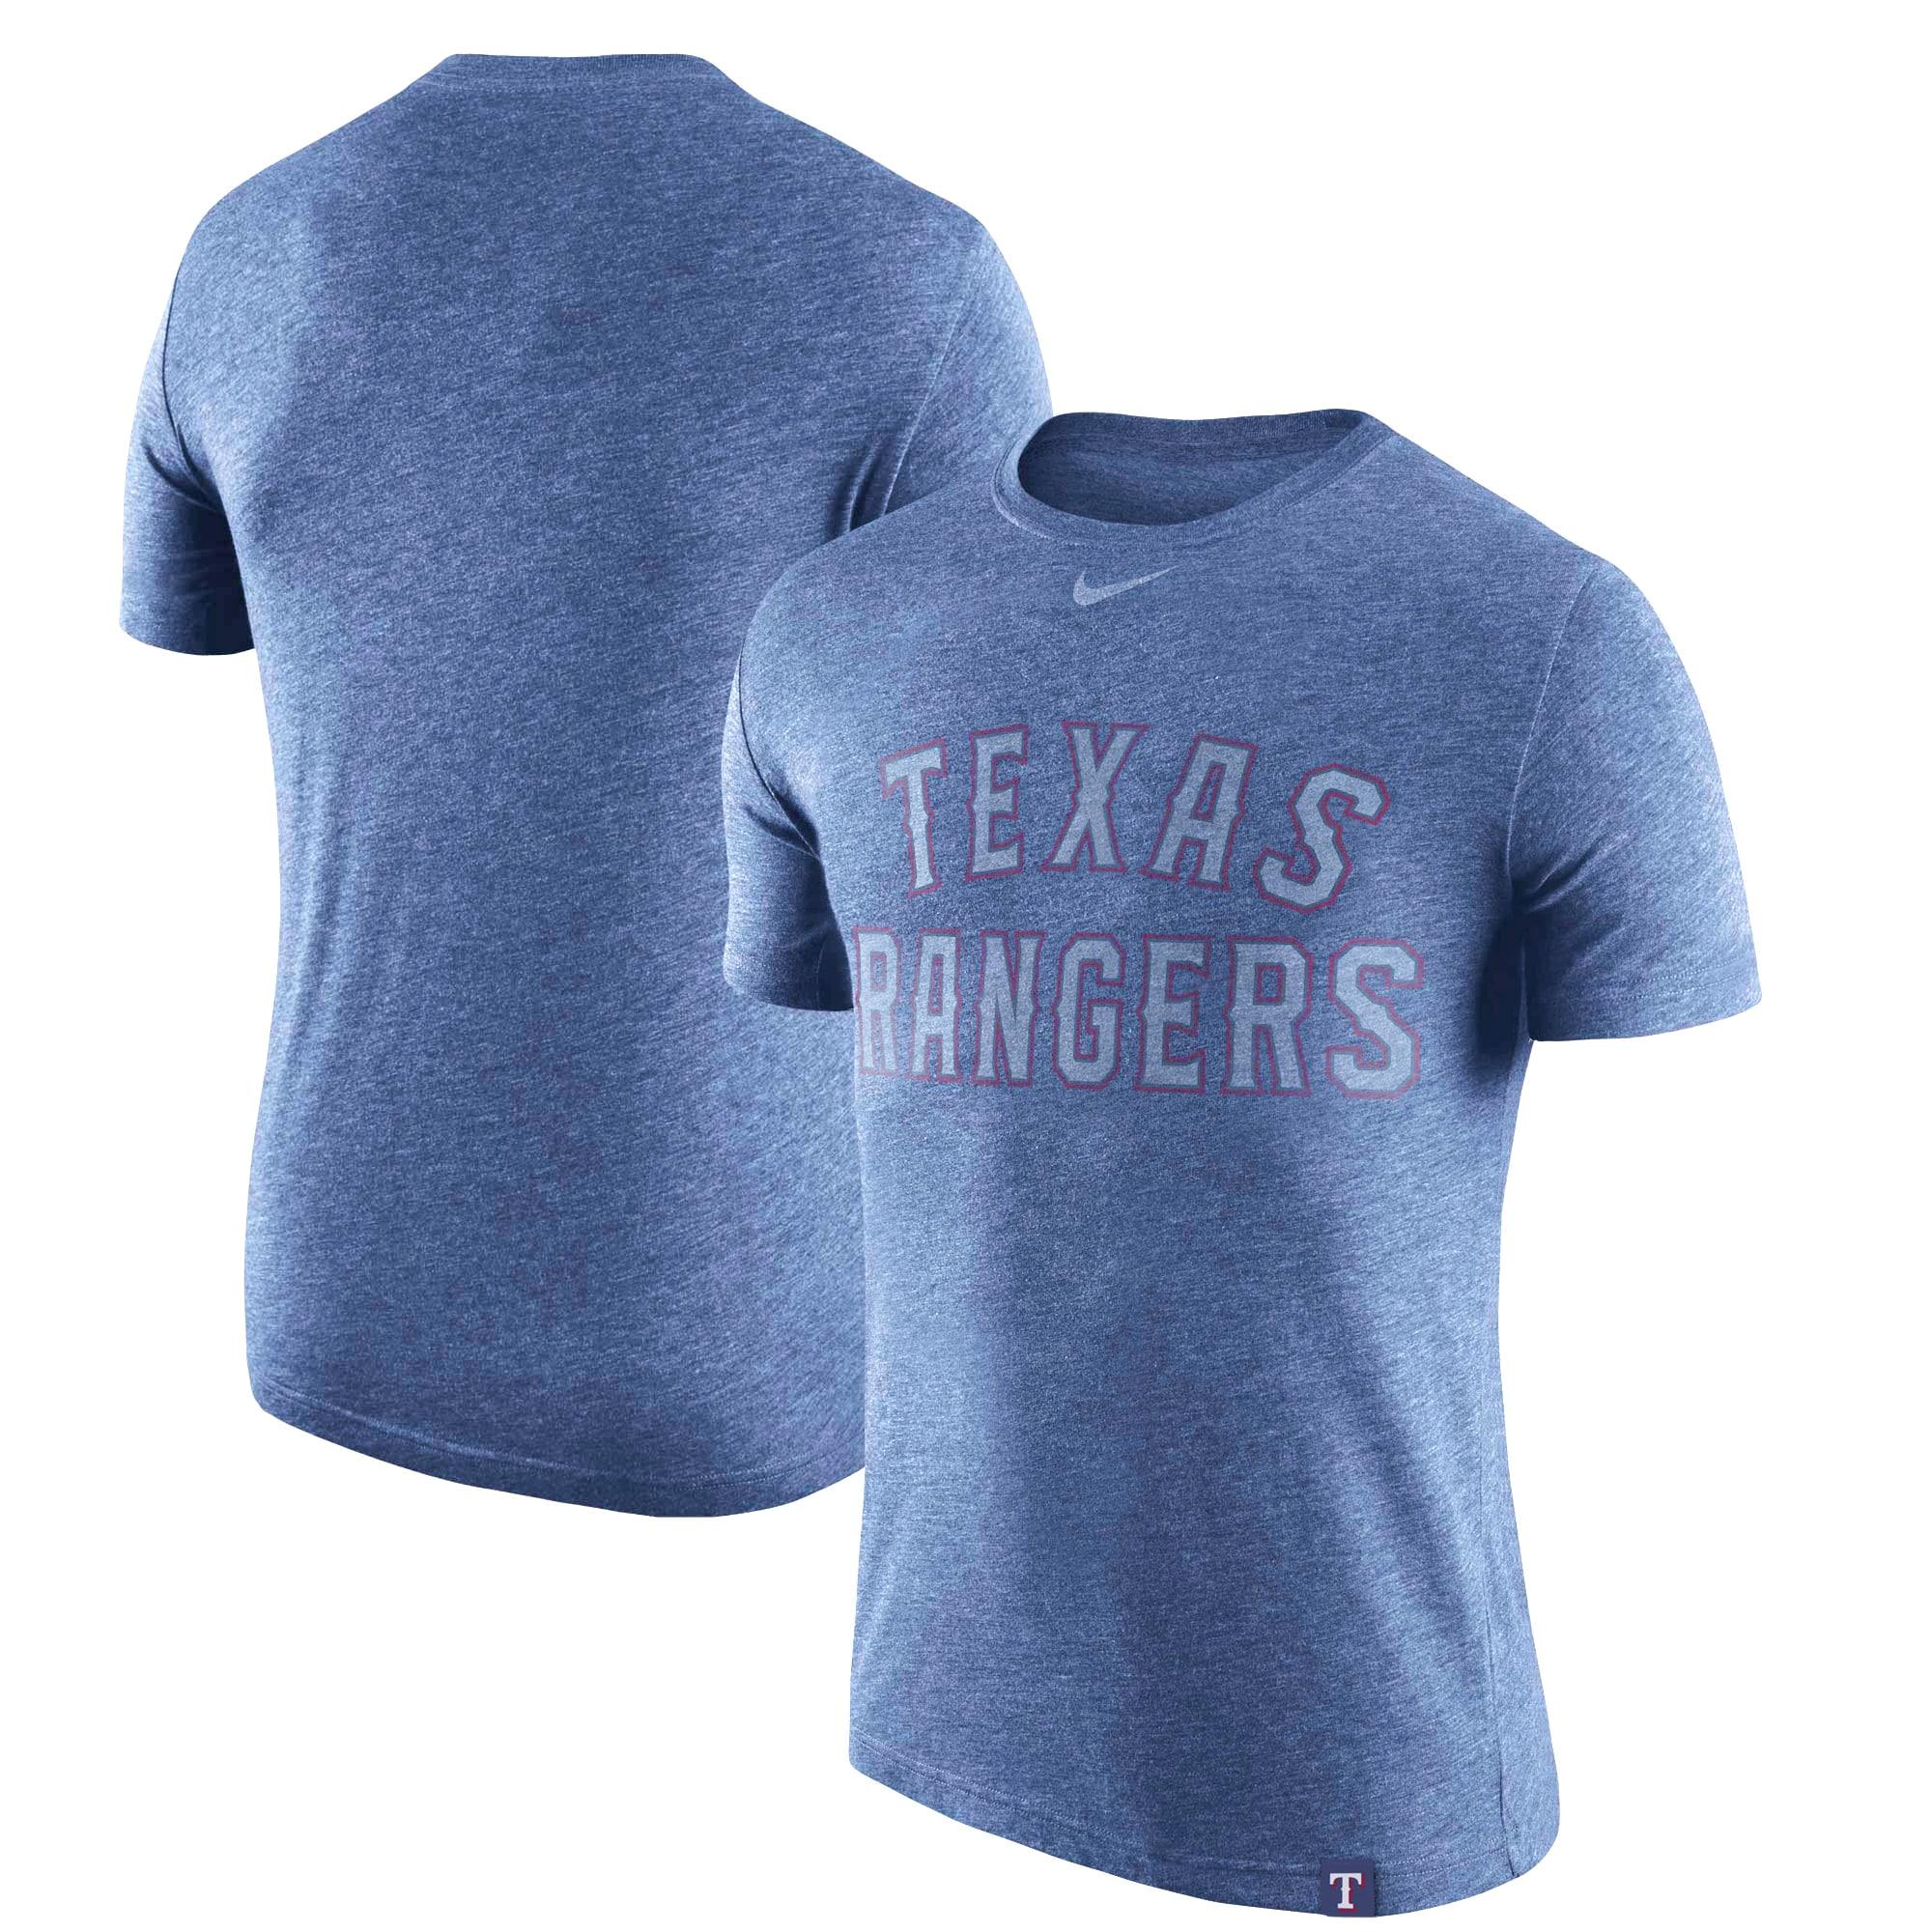 Texas Rangers Nike Tri-Blend DNA Performance T-Shirt - Heathered Royal